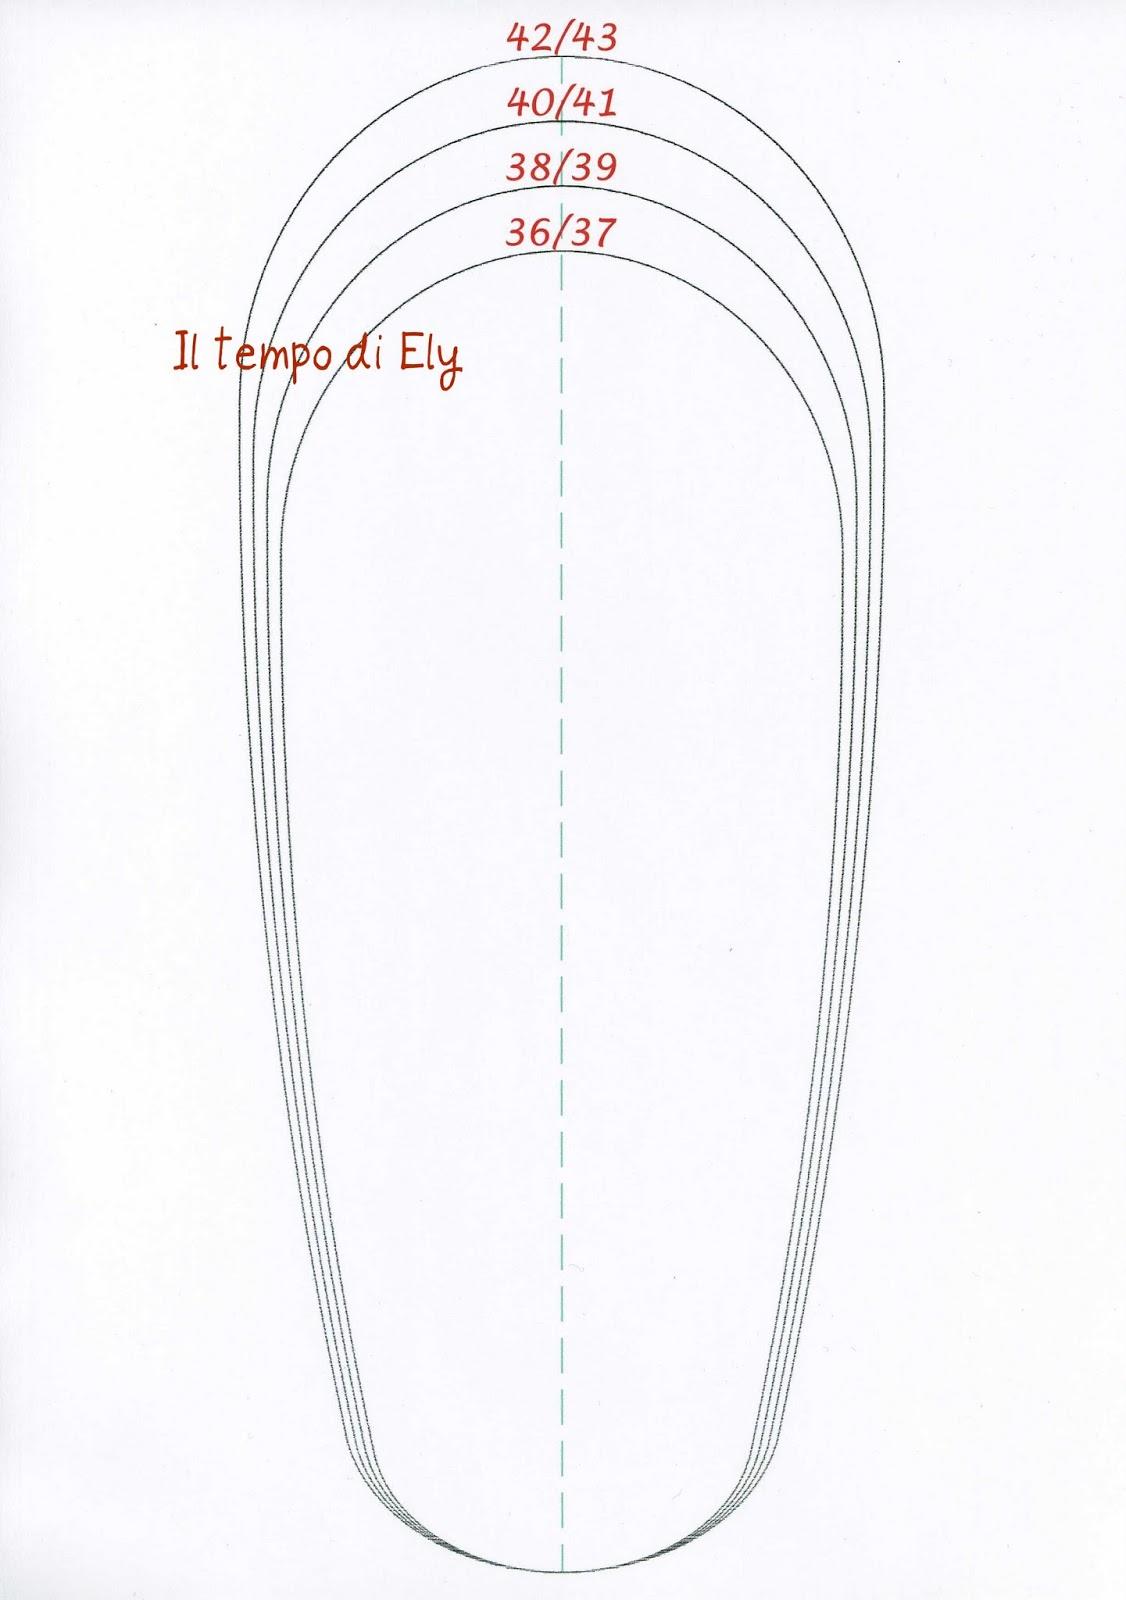 Ремонт замка ремня безопасности ваз 2110 своими руками 8